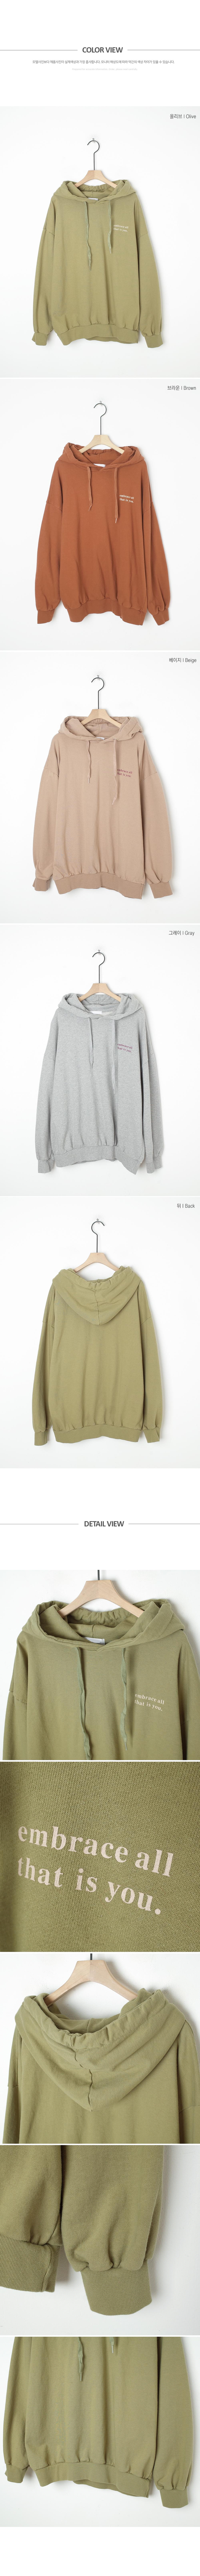 Comfortable Daily Look Hooded Sweatshirt